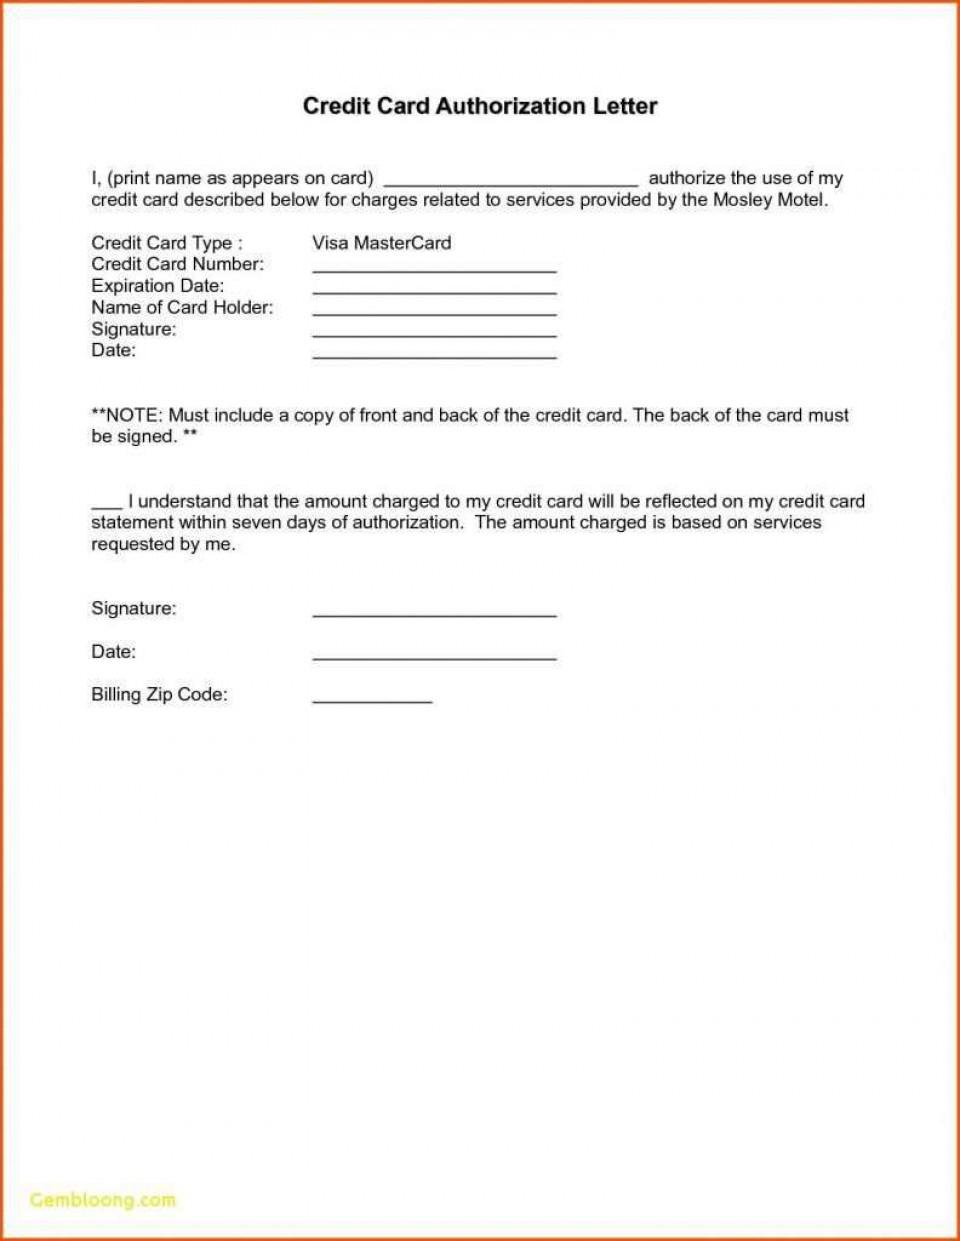 000 Remarkable Credit Card Usage Request Form Template Design 960